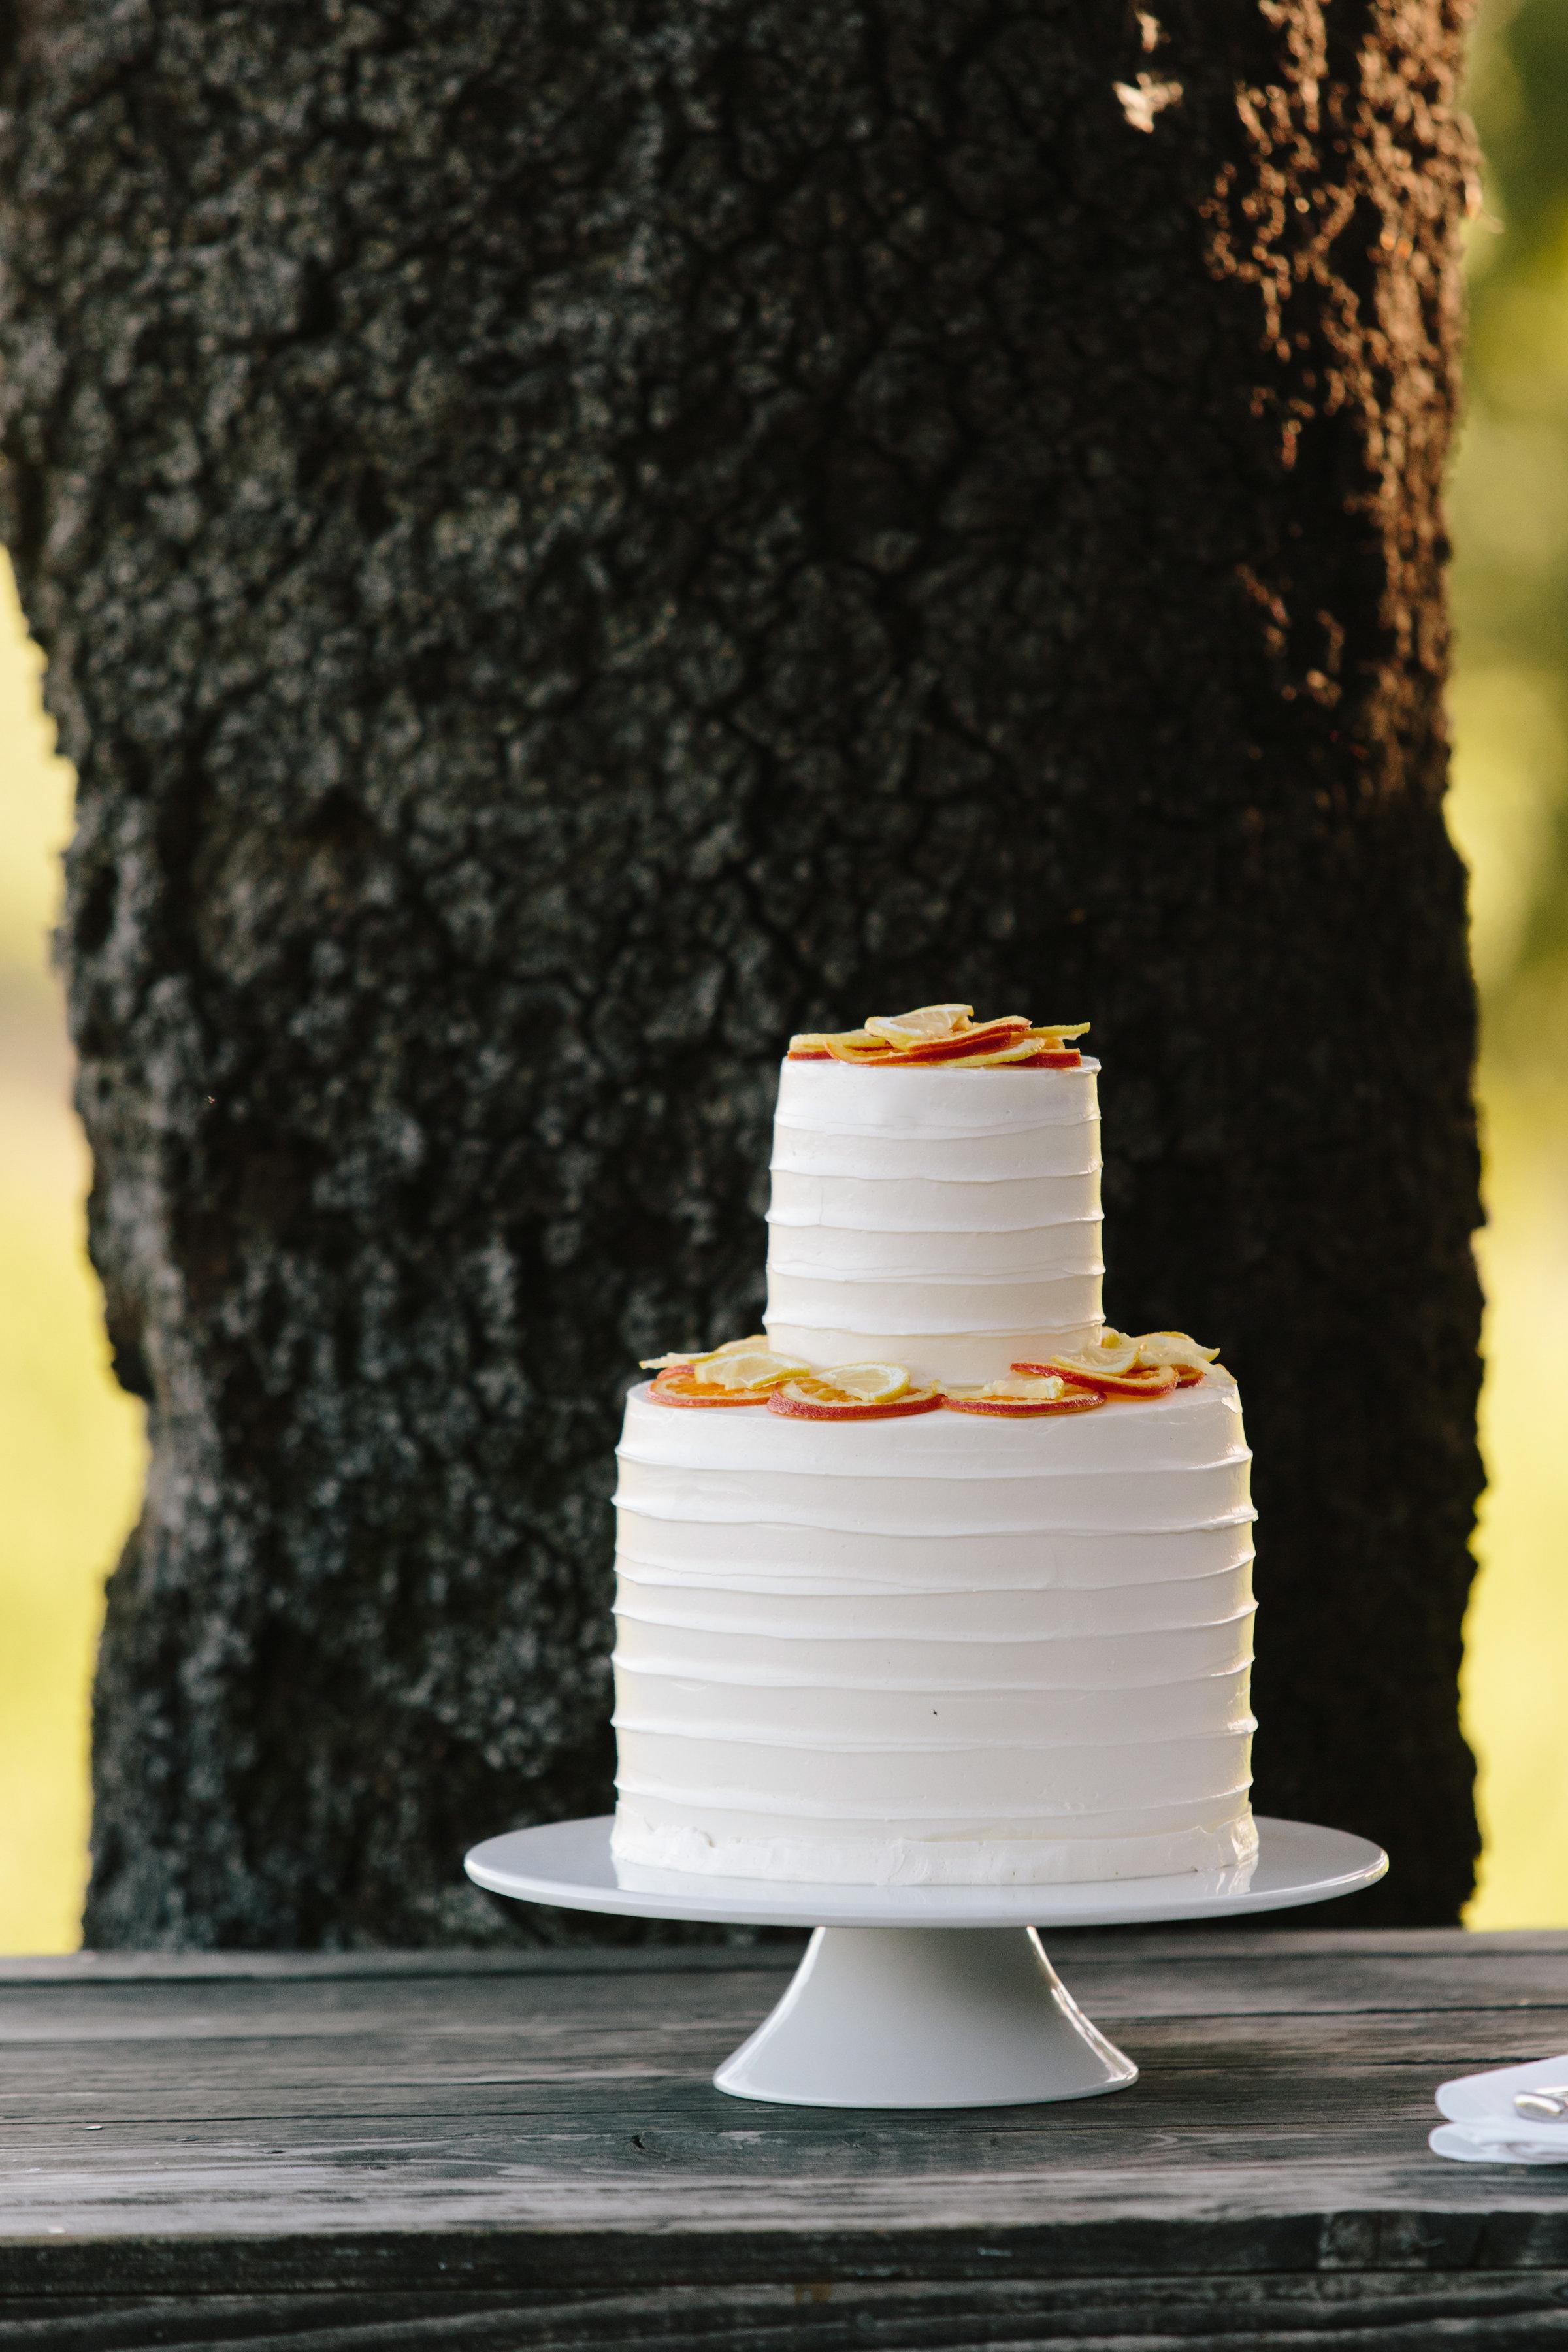 Modern - Minimal Wine Country Wedding at Scriber WInery - Cakebloom - Sonoma, CA -Simone-Anne Photography